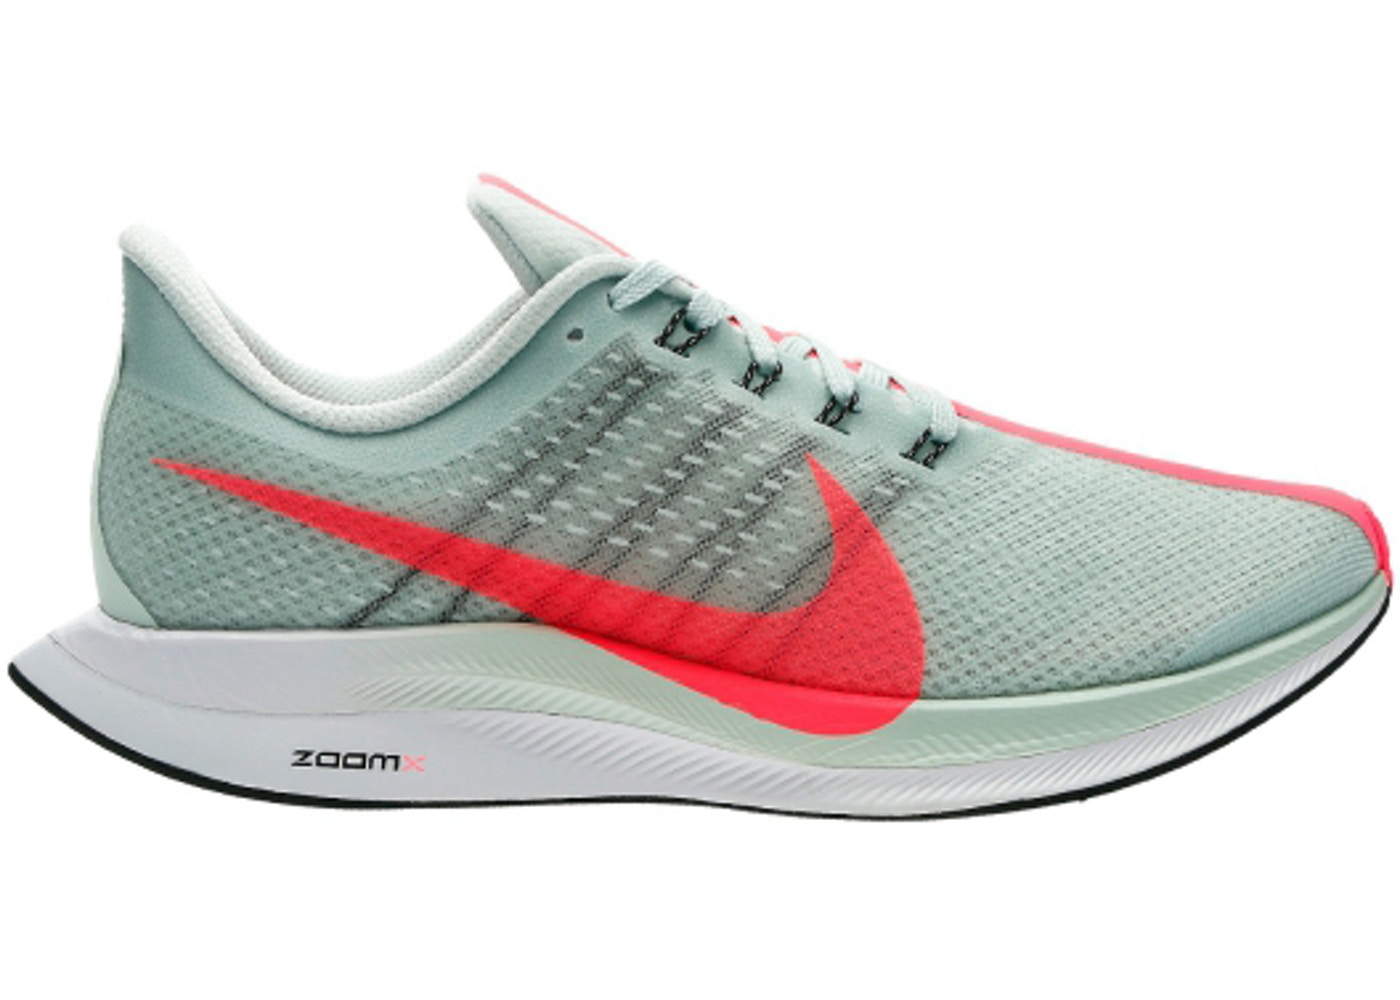 e71fa1c0d4de6 Nike Zoom Pegasus 35 Turbo Wolf Grey Hot Punch (W) - AJ4115-060